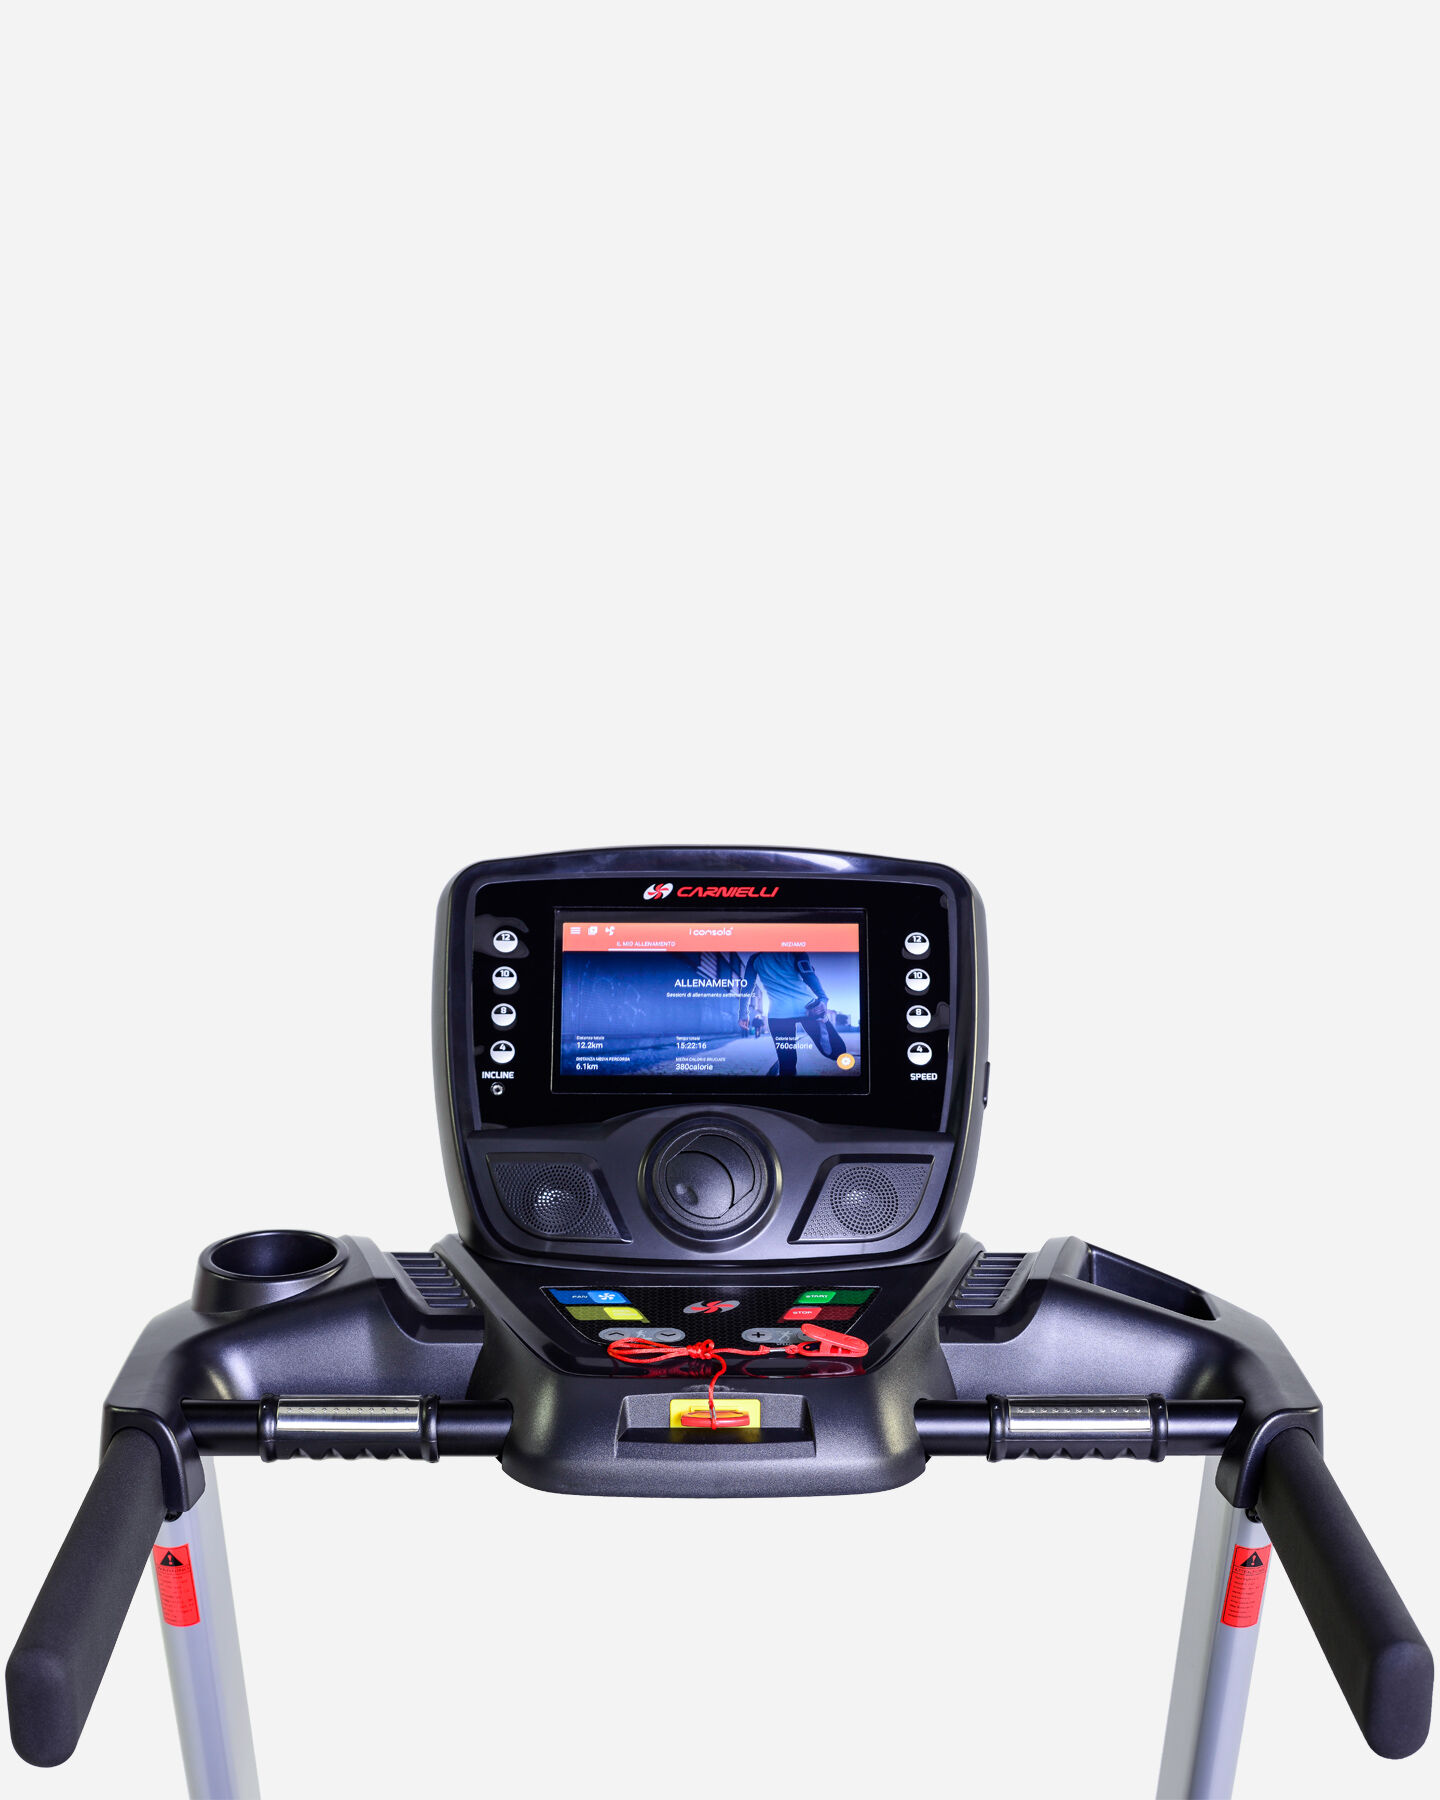 Tapis roulant CARNIELLI HP PRO RACE PLUS S5266091|1|UNI scatto 2